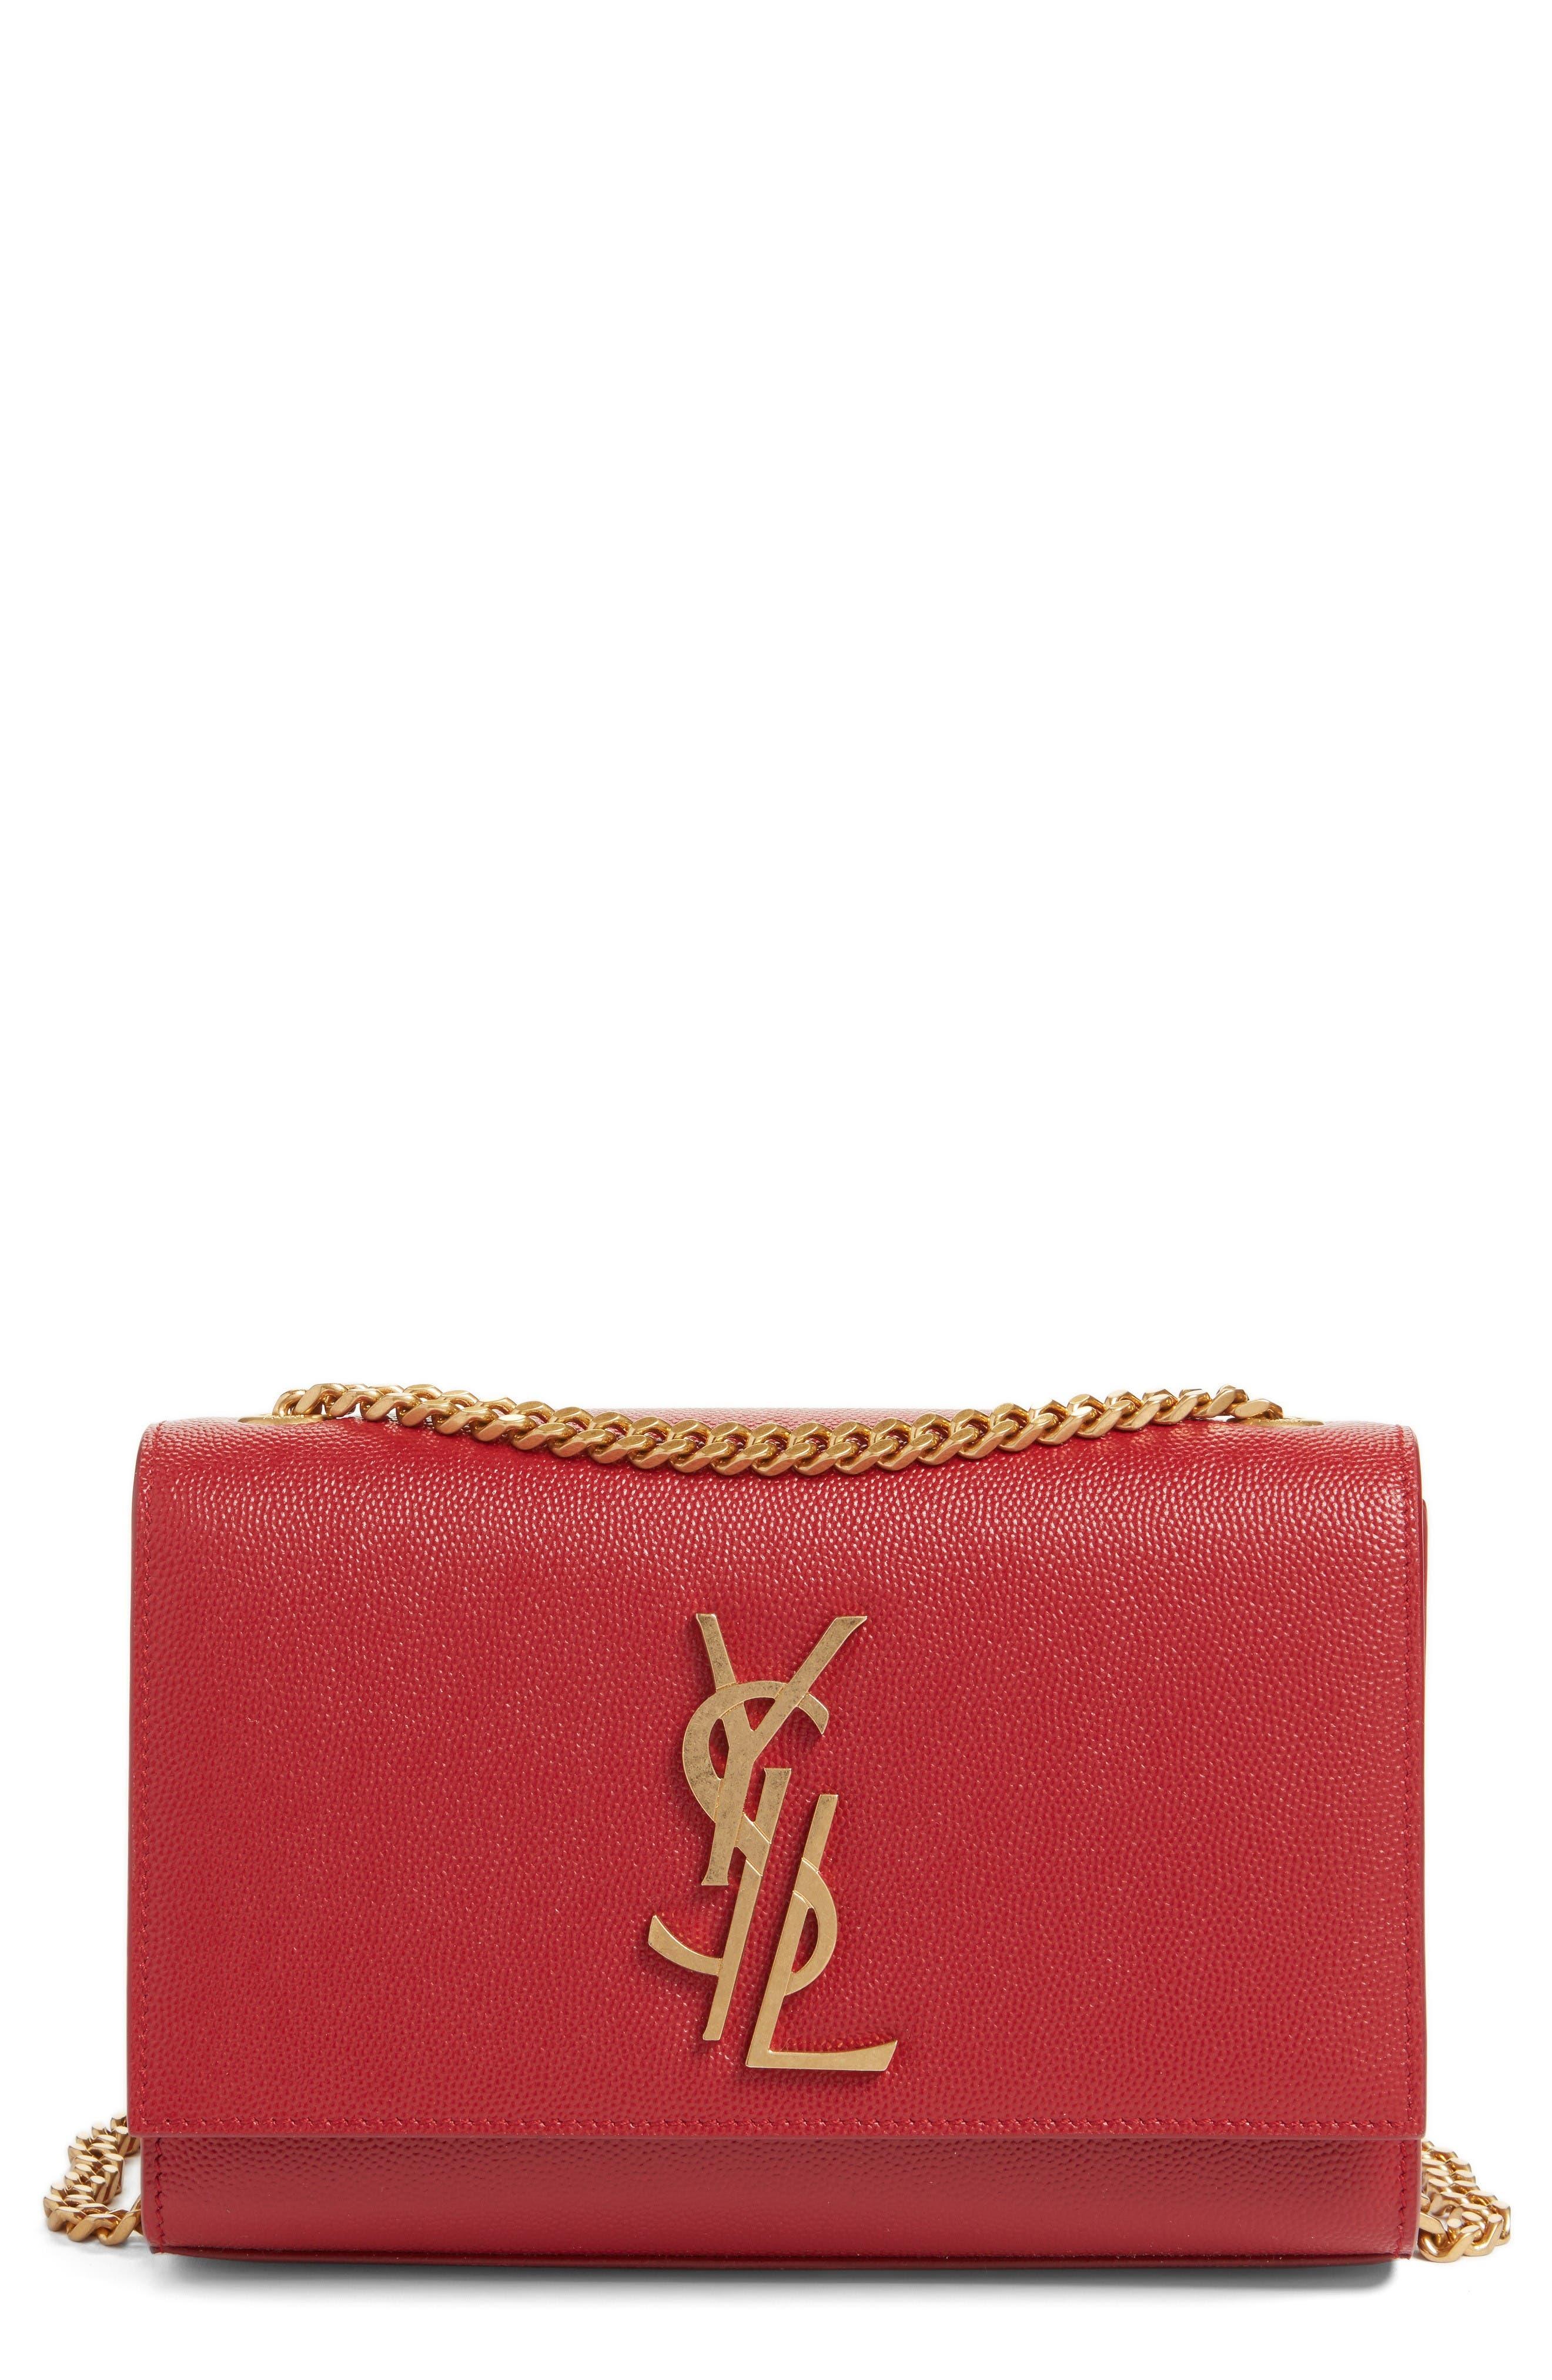 Alternate Image 1 Selected - Saint Laurent Small Kate Calfskin Leather Crossbody Bag